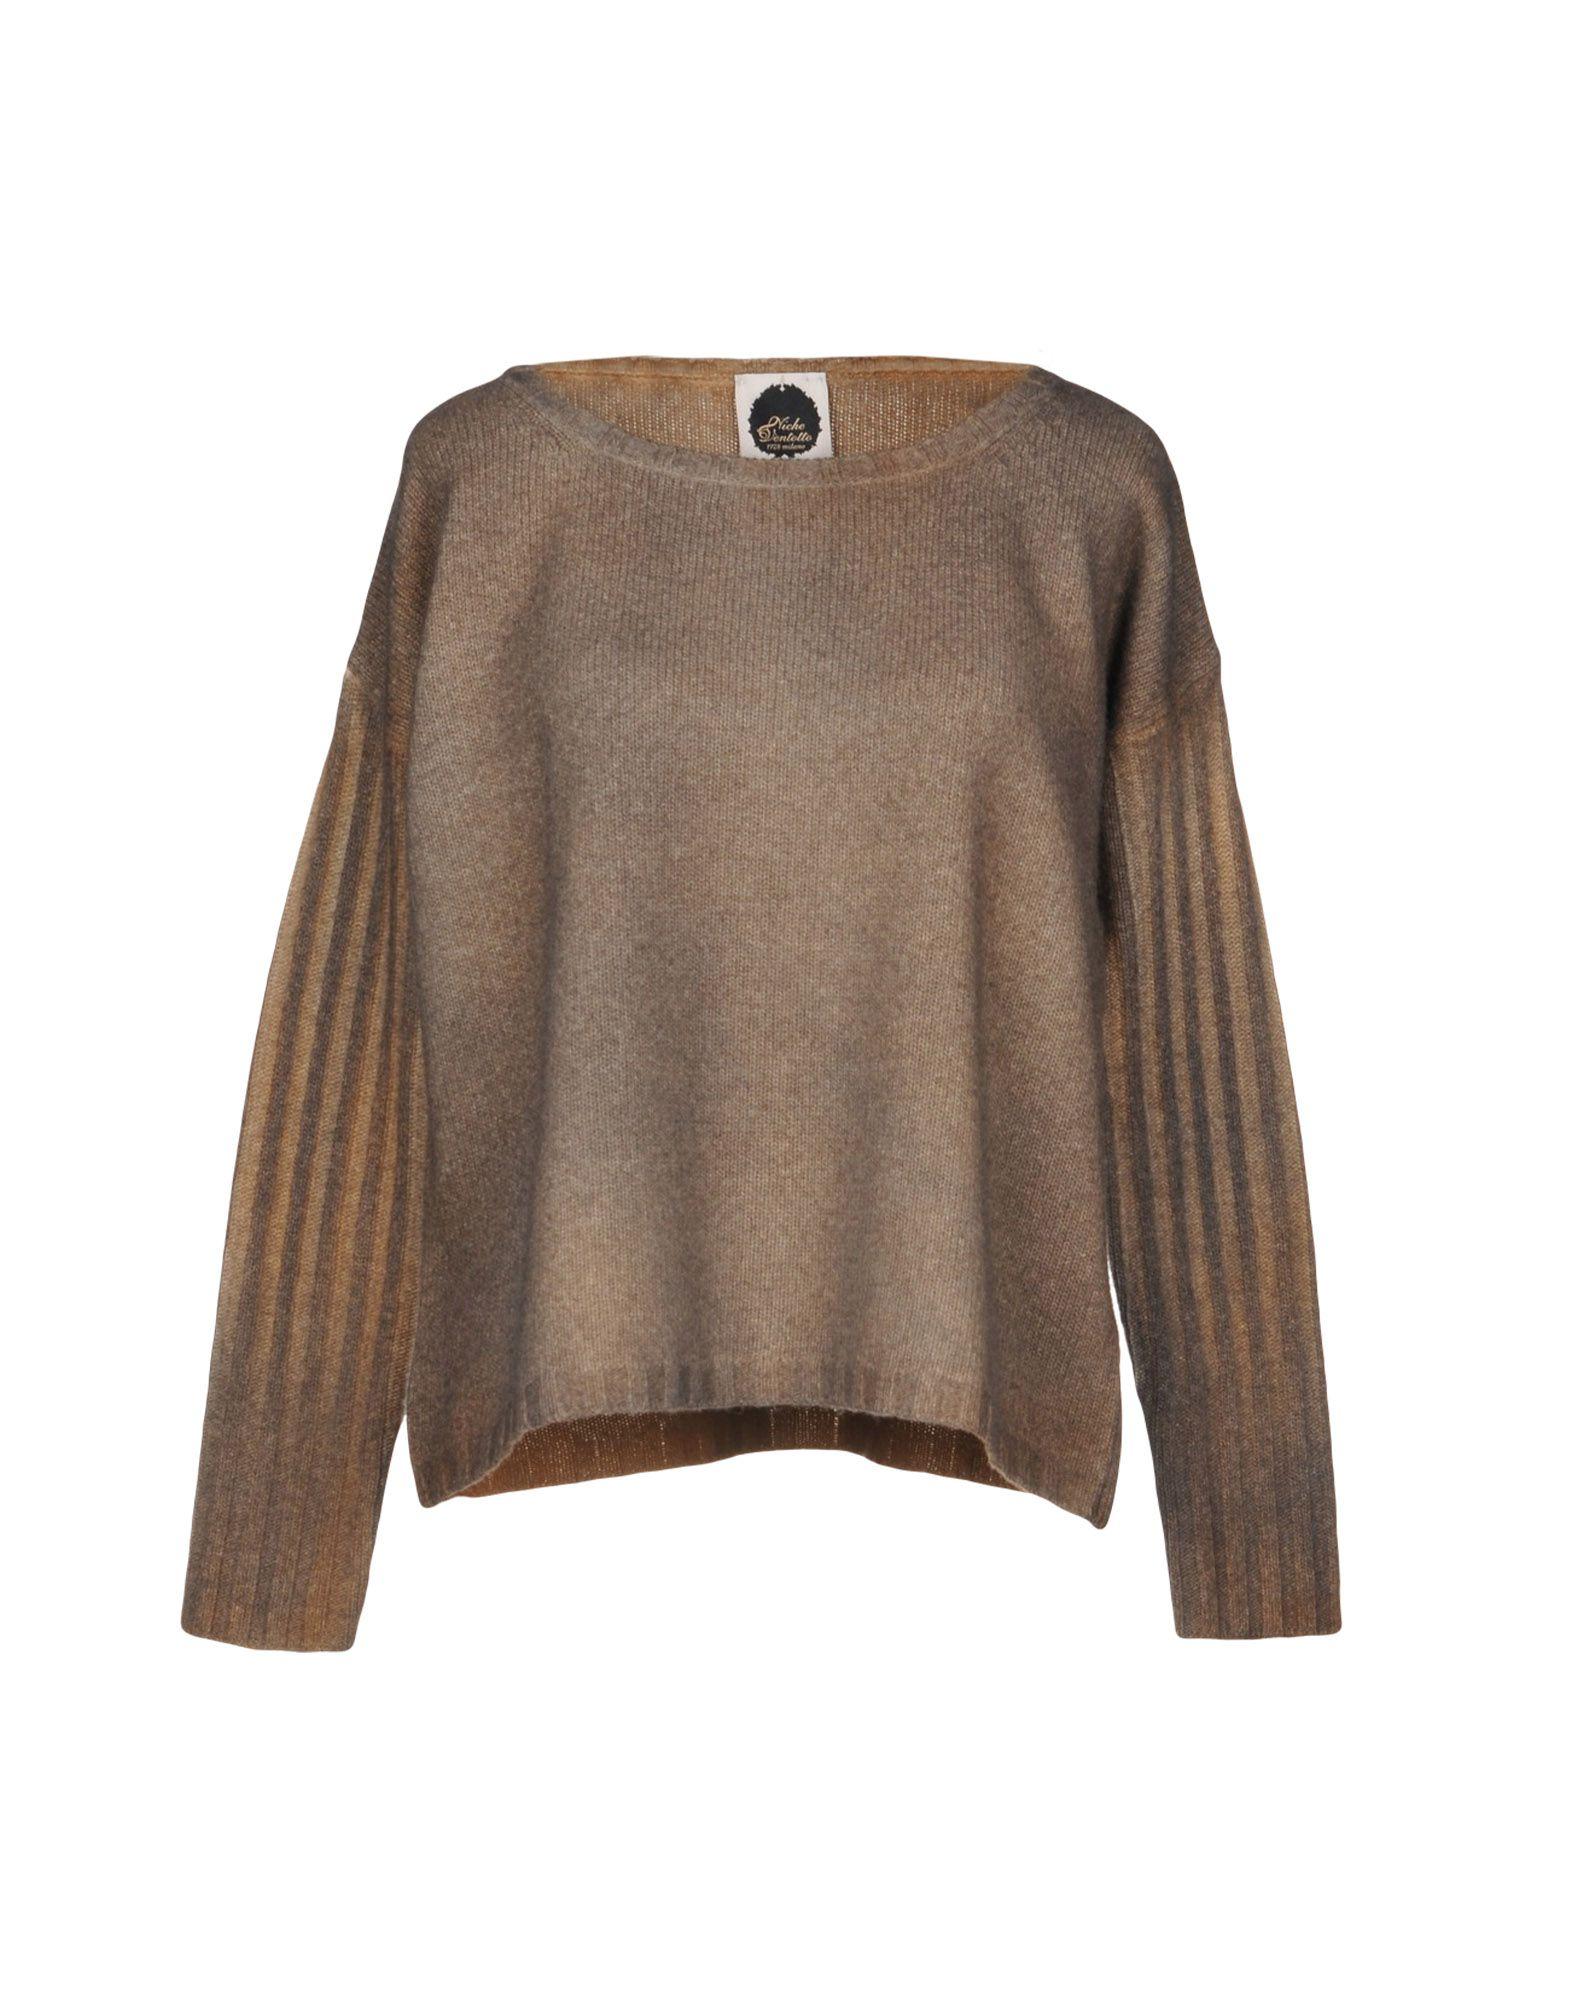 NICHE VENTOTTO Sweater in Beige